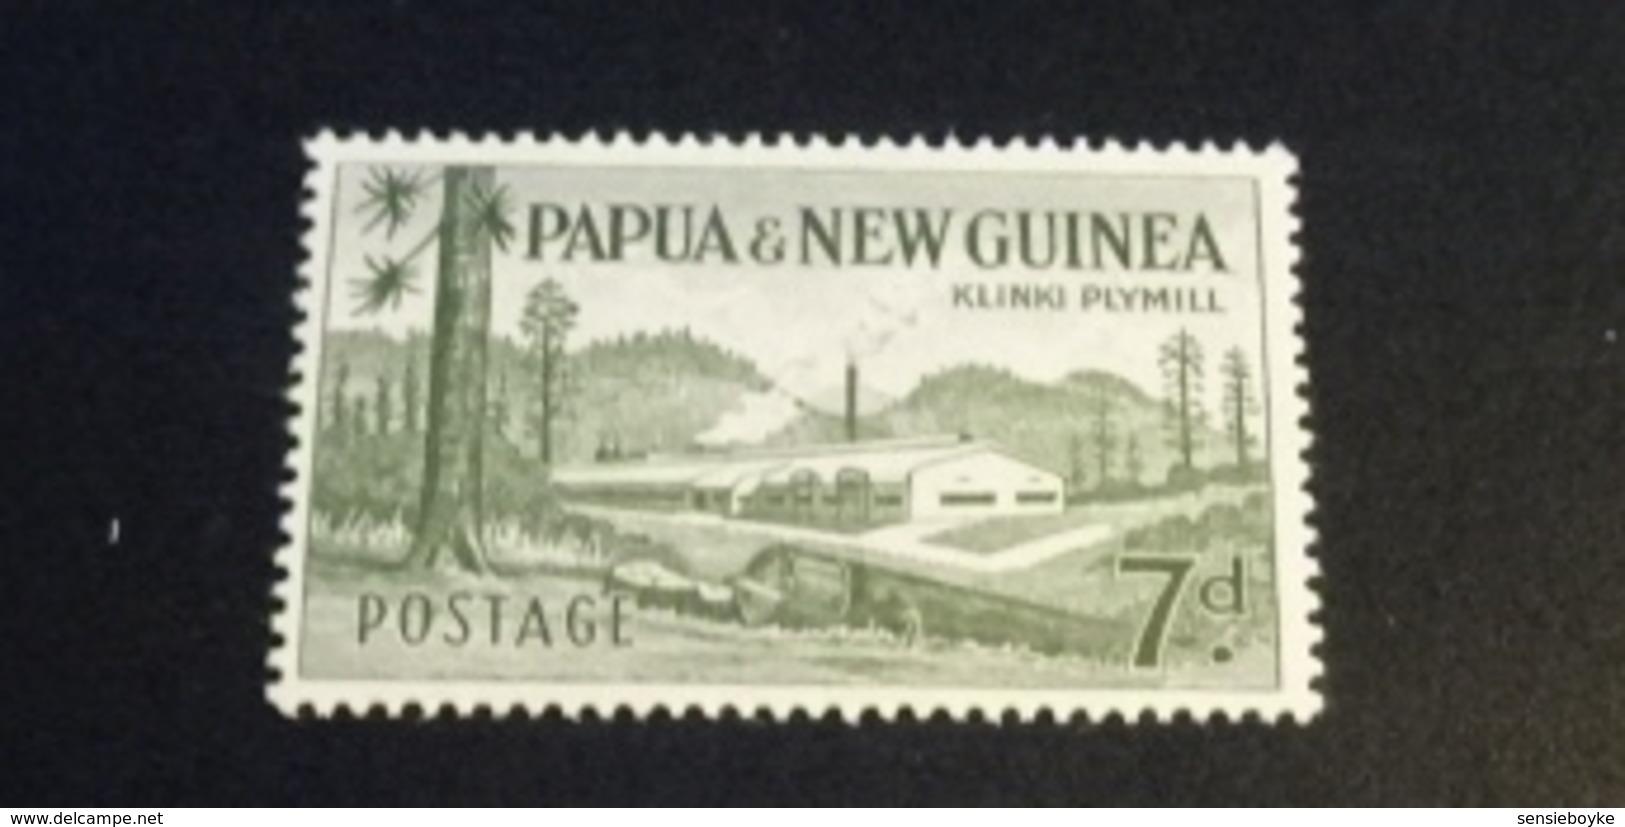 K33623 -stamp  MNH Paoua New Guinea - 1958 - SC. 142 - 7p Gray Green - Klinki Plymill - Peru